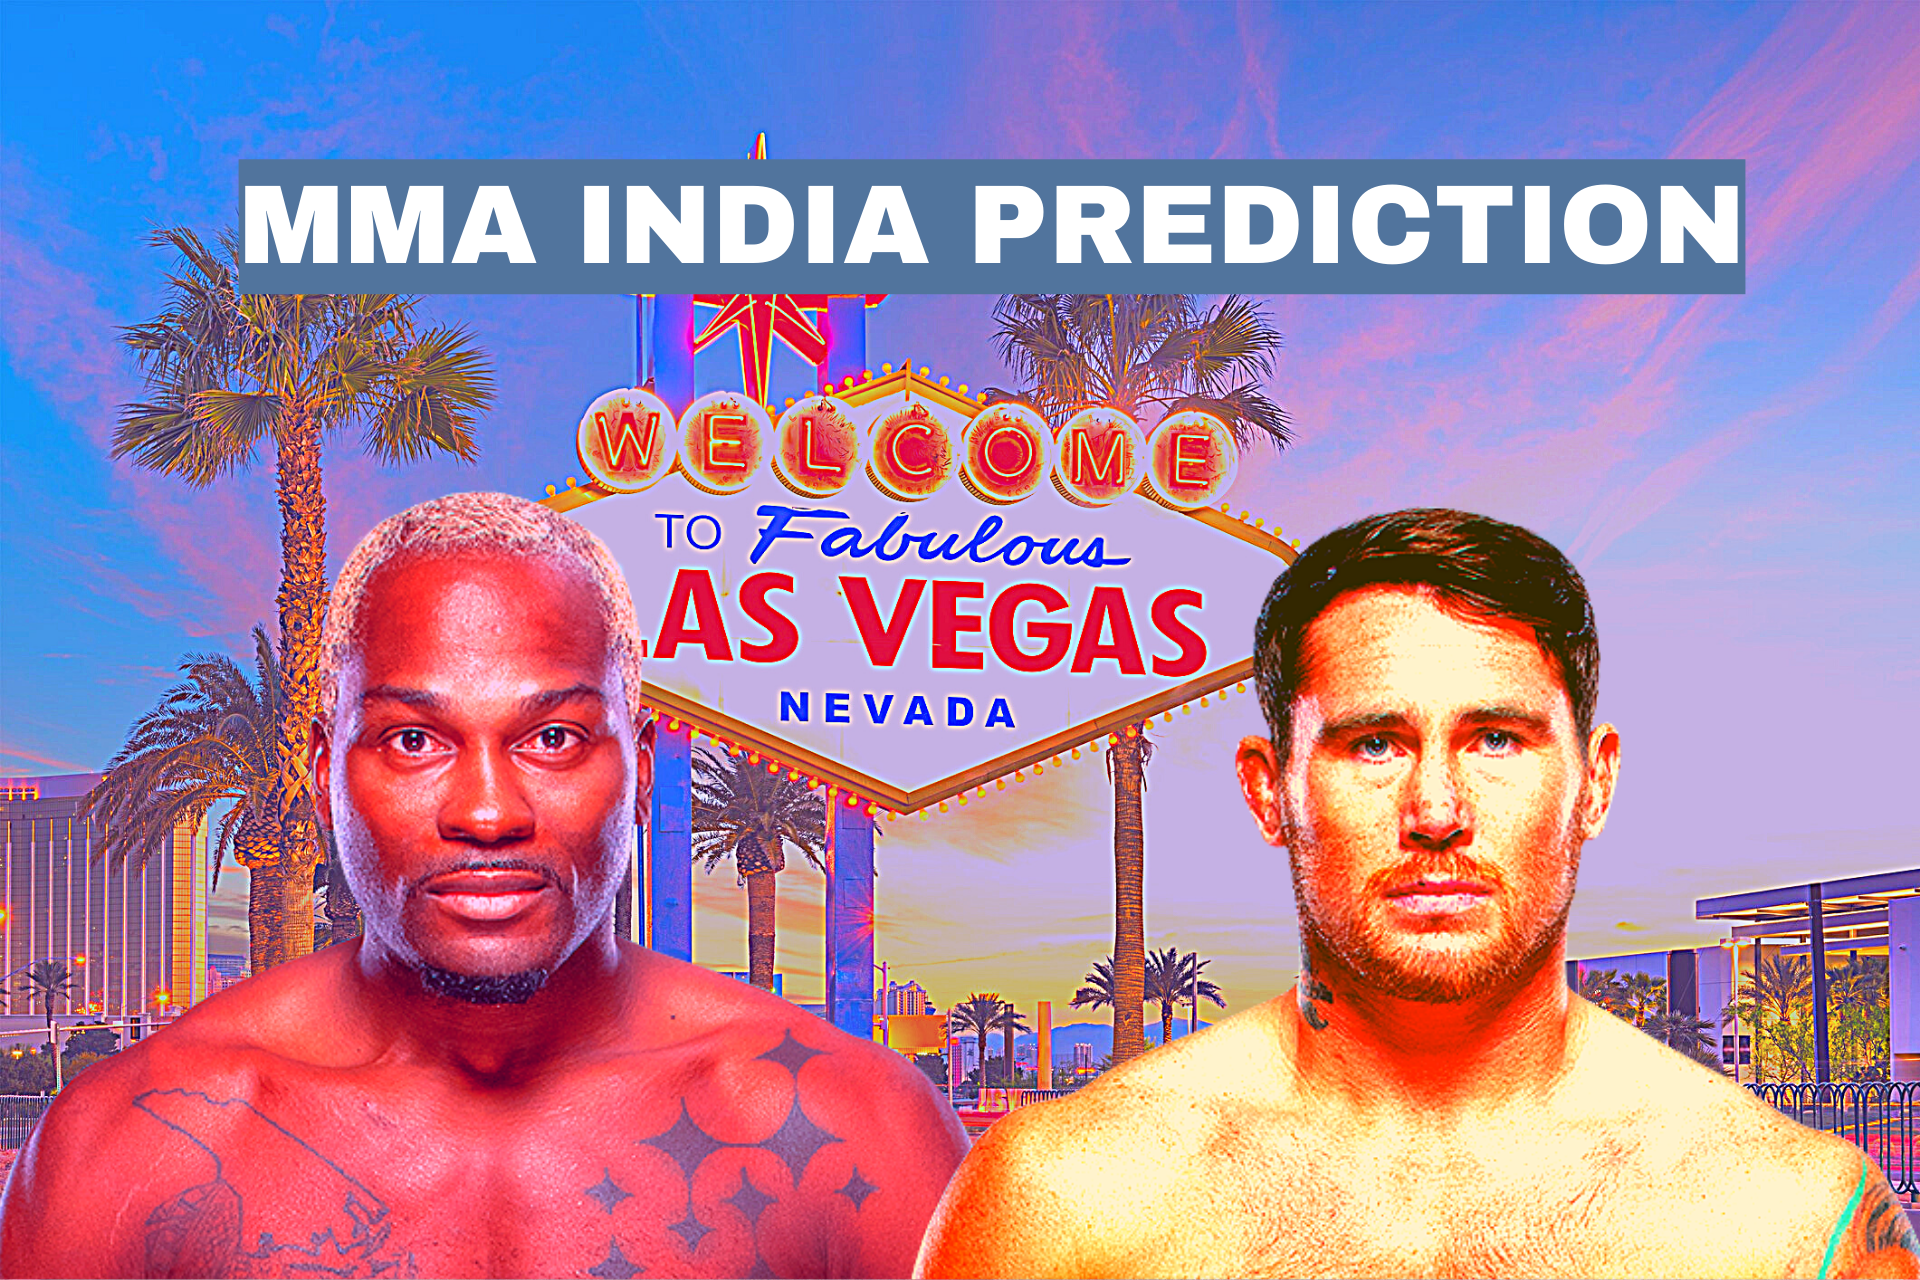 UFC Vegas 36: Brunson vs Till Betting Odds and Prediction - Brunson